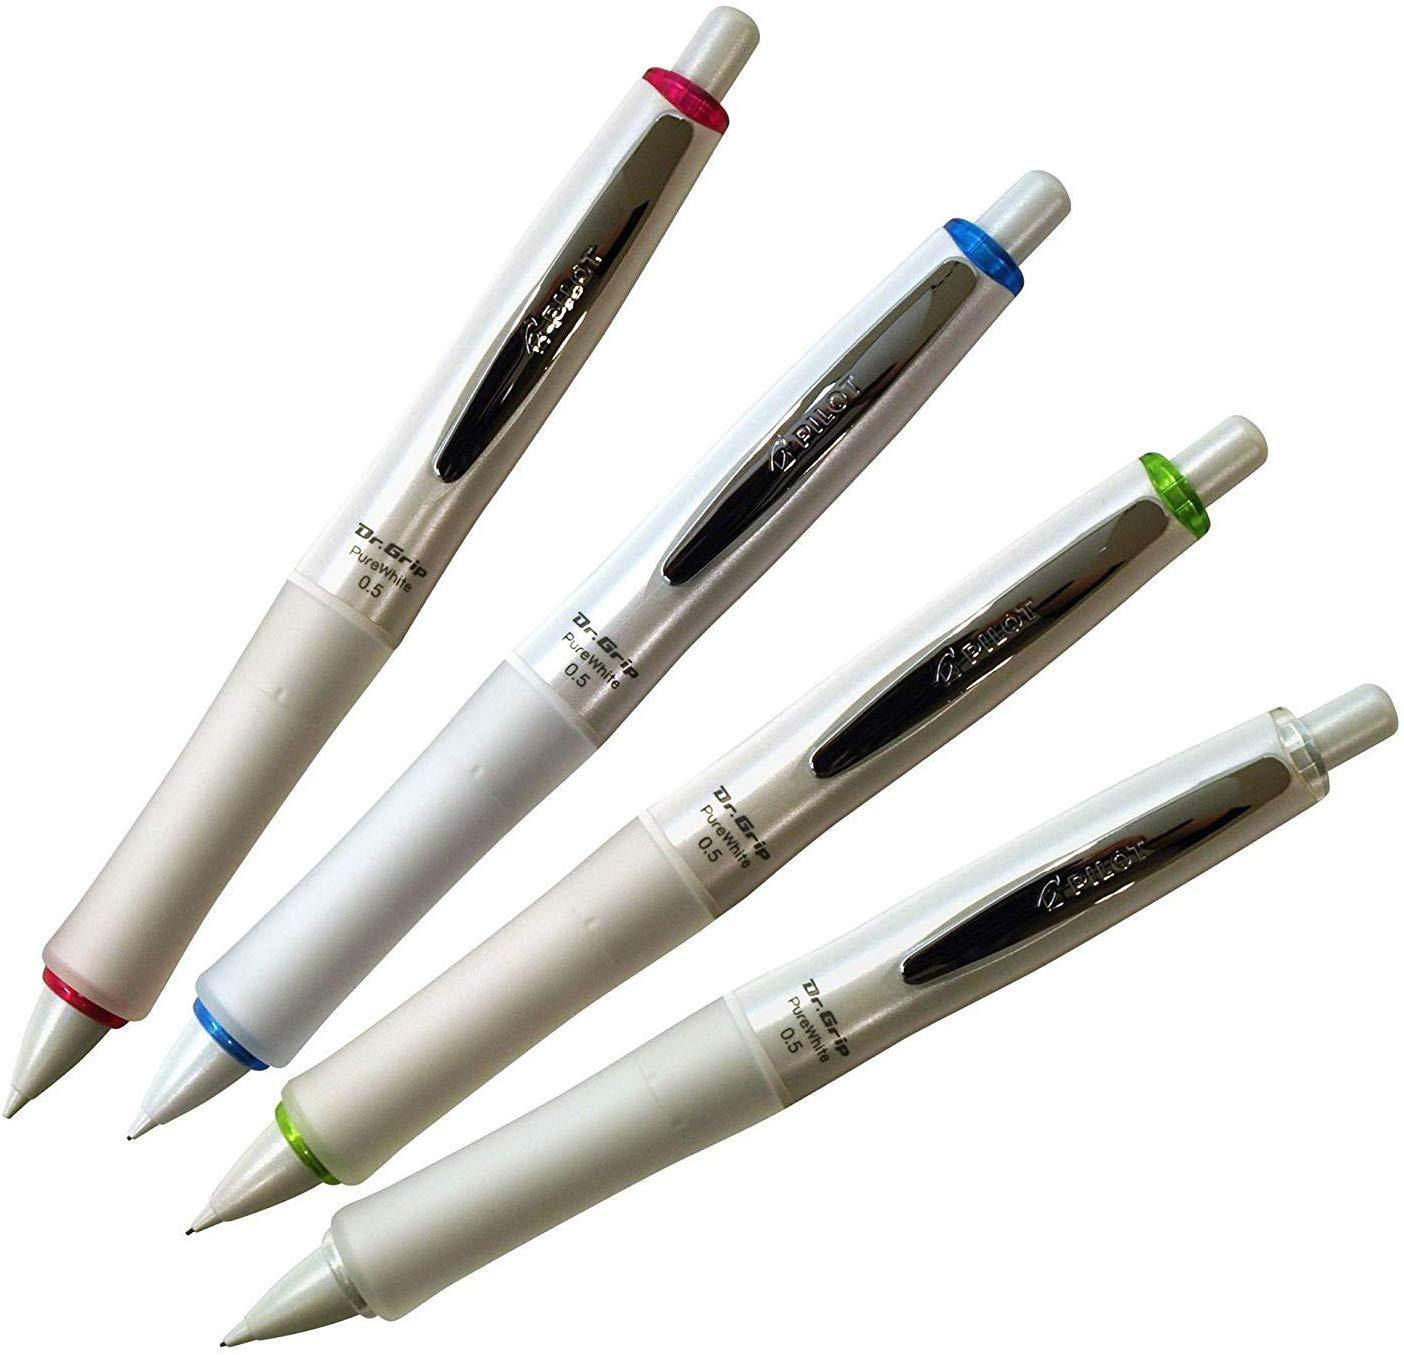 Lapiseira - Pilot - Dr. Grip Pure White Shaker 0.5mm - Japan